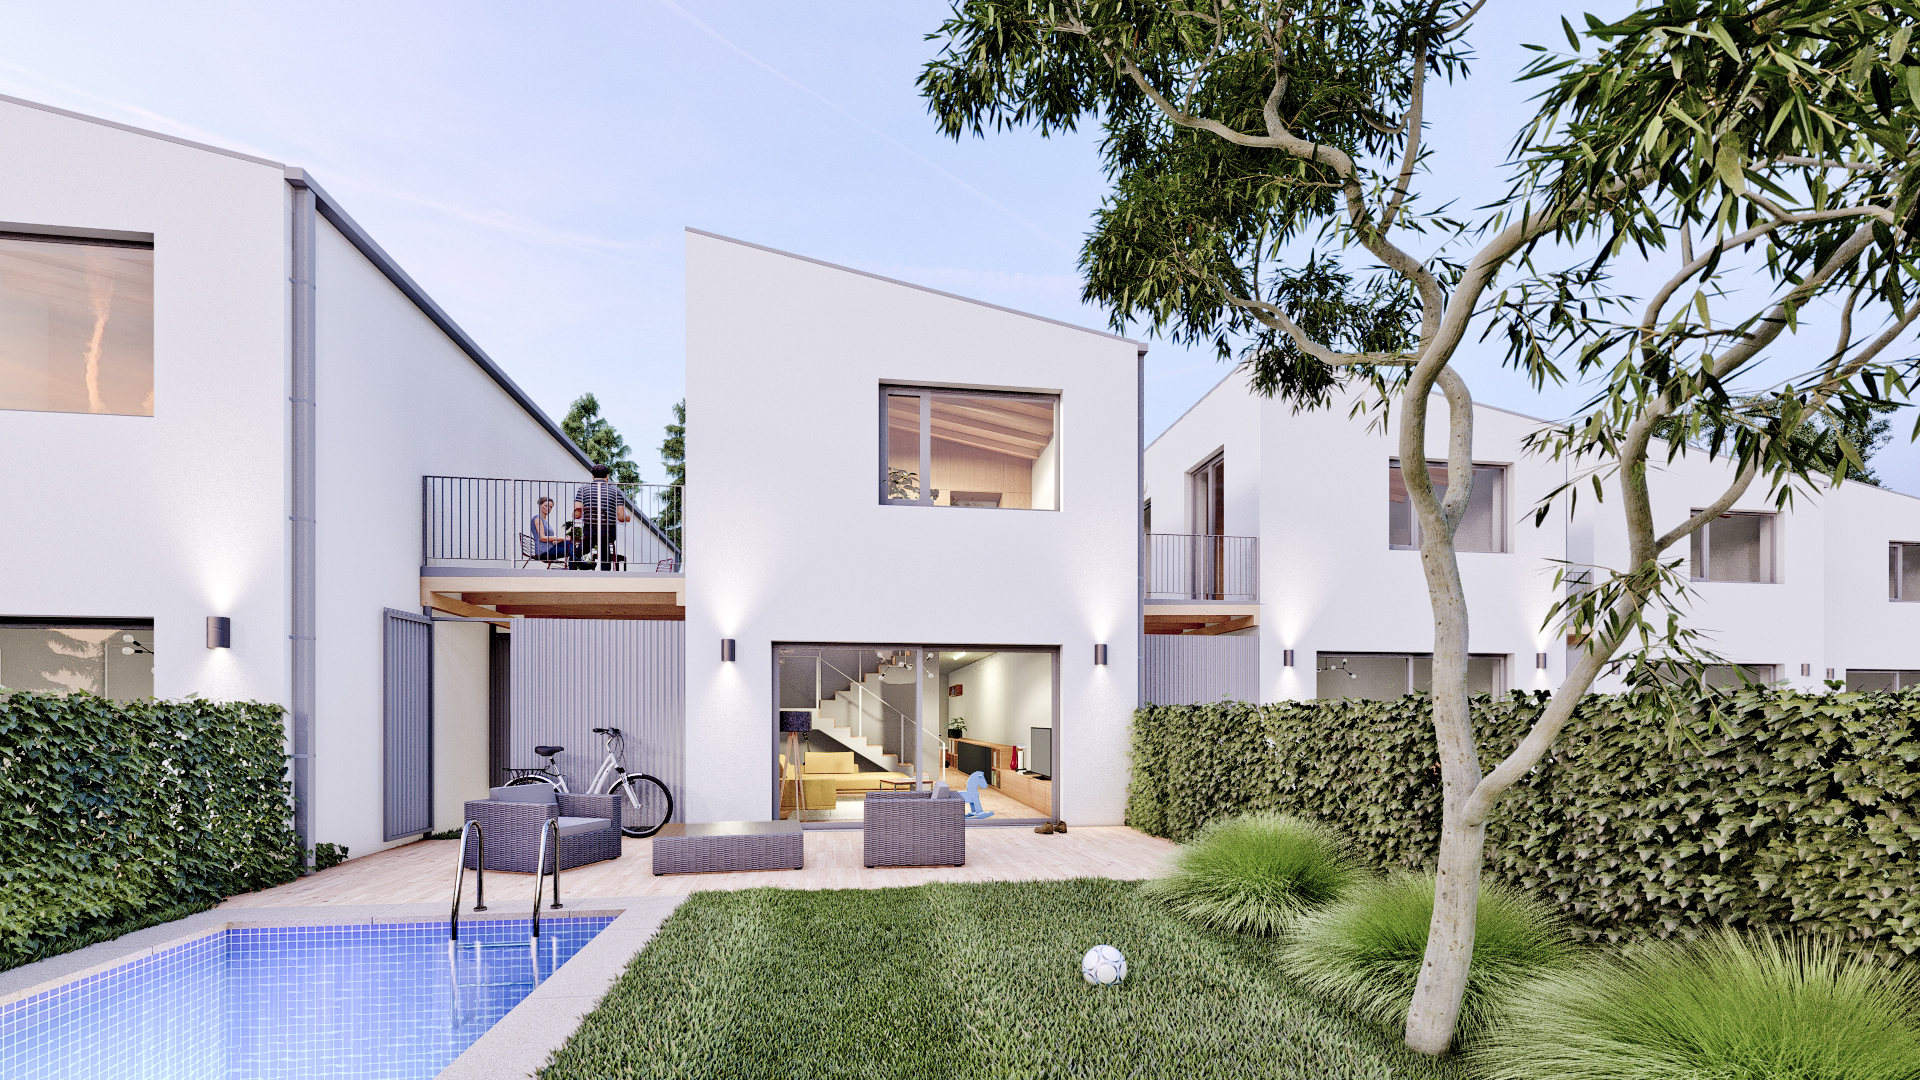 Kostaka stav development - projekt sedm domů